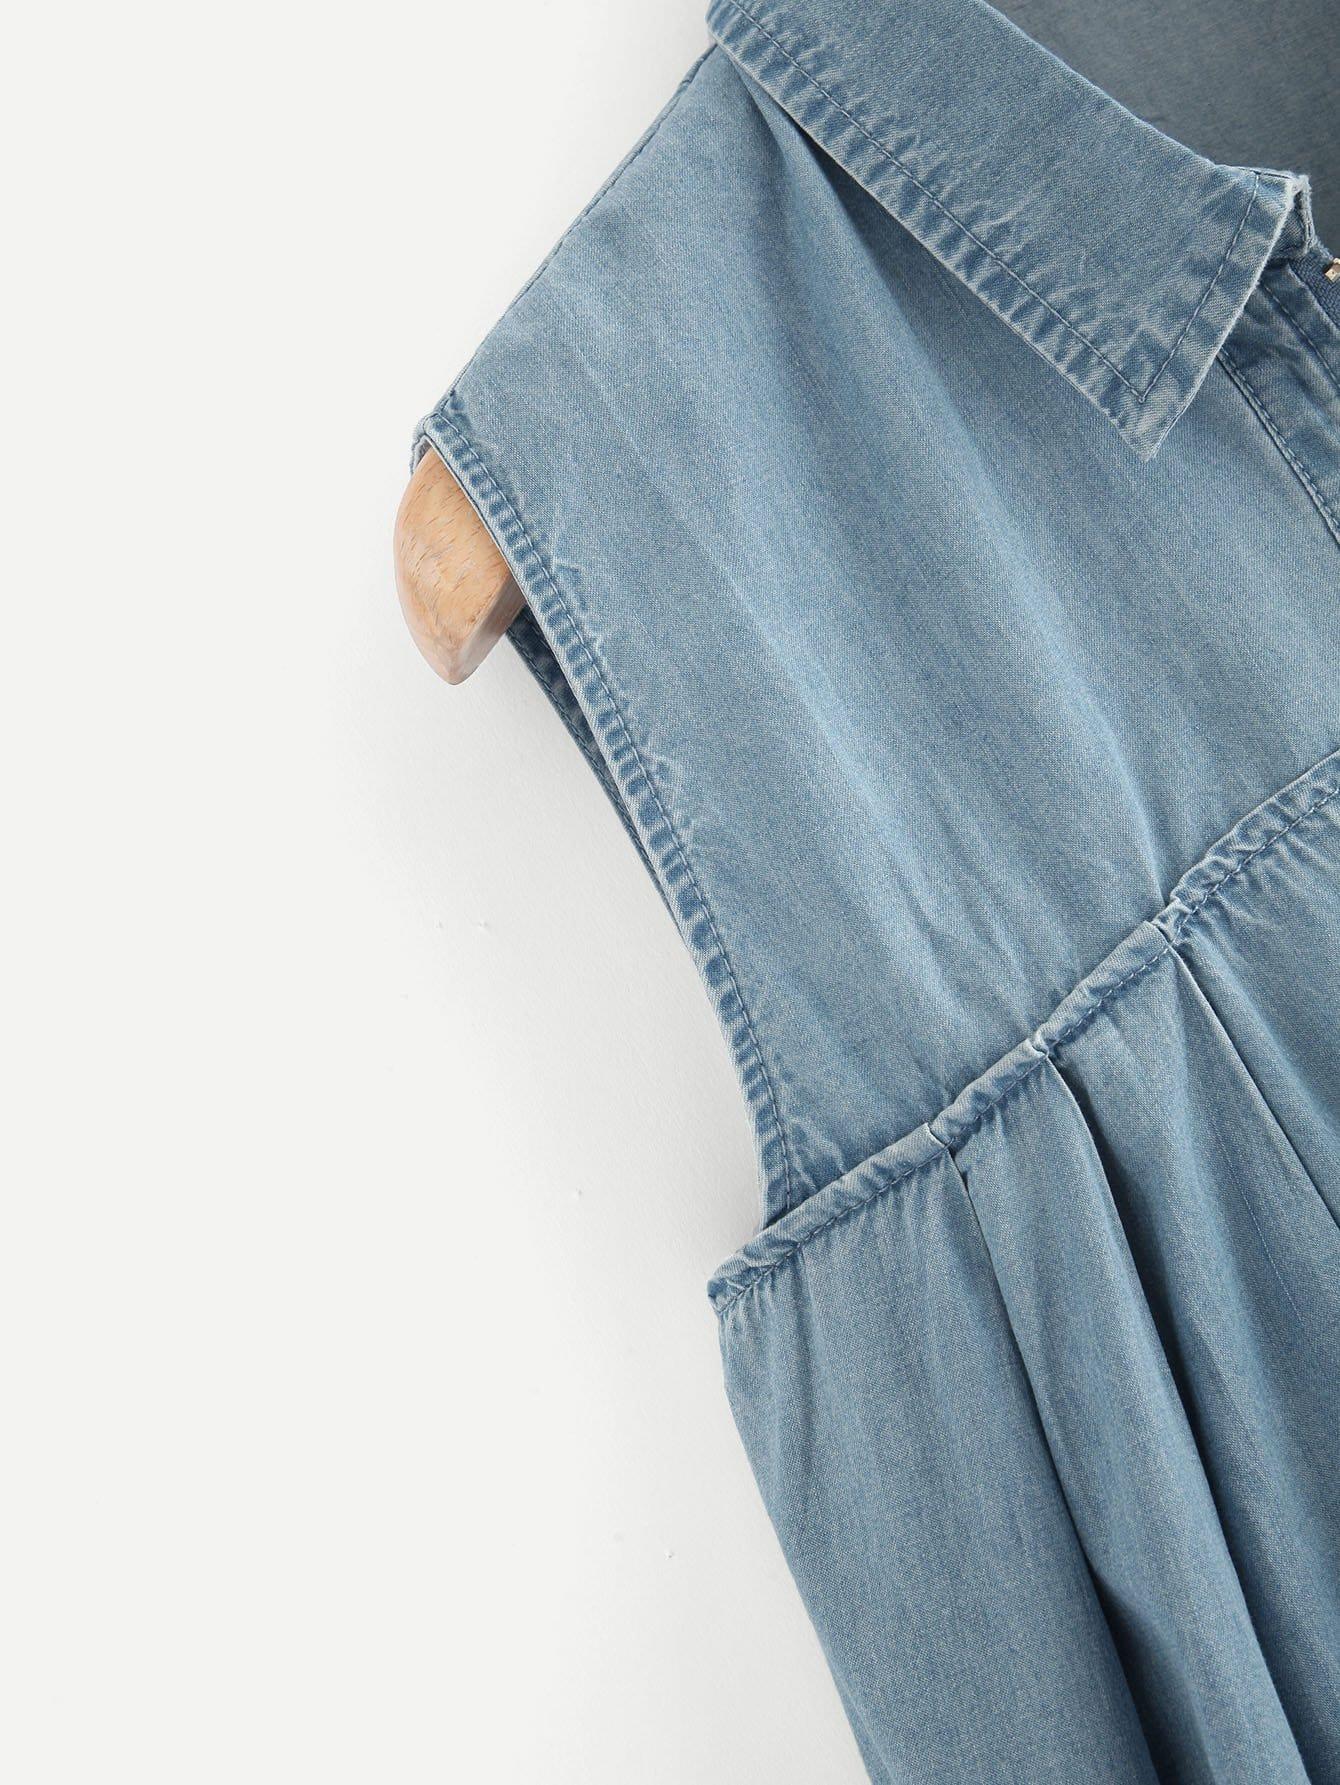 robe en jean ourlet brut avec fermeture clair devant french shein sheinside. Black Bedroom Furniture Sets. Home Design Ideas